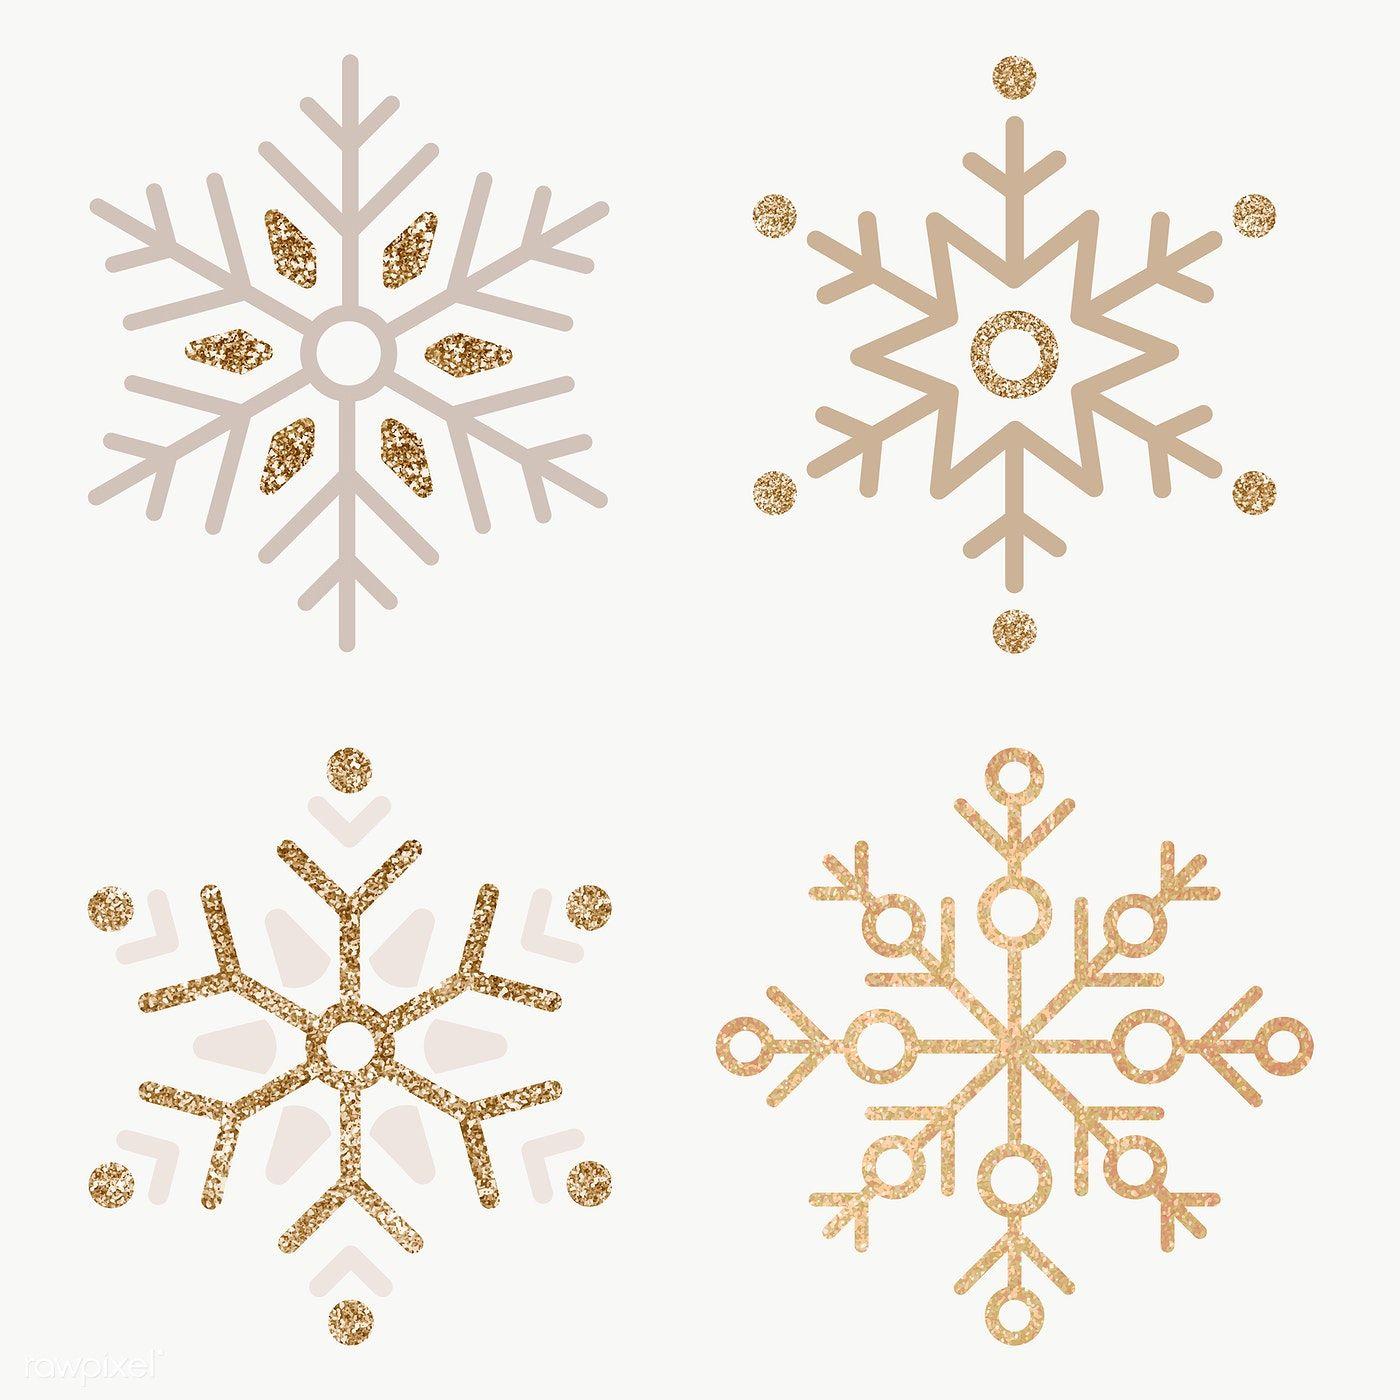 Golden Snowflake Set Social Ads Template Transparent Png Premium Image By Rawpixel Com Sasi Christmas Graphic Design Snowflakes Christmas Icons